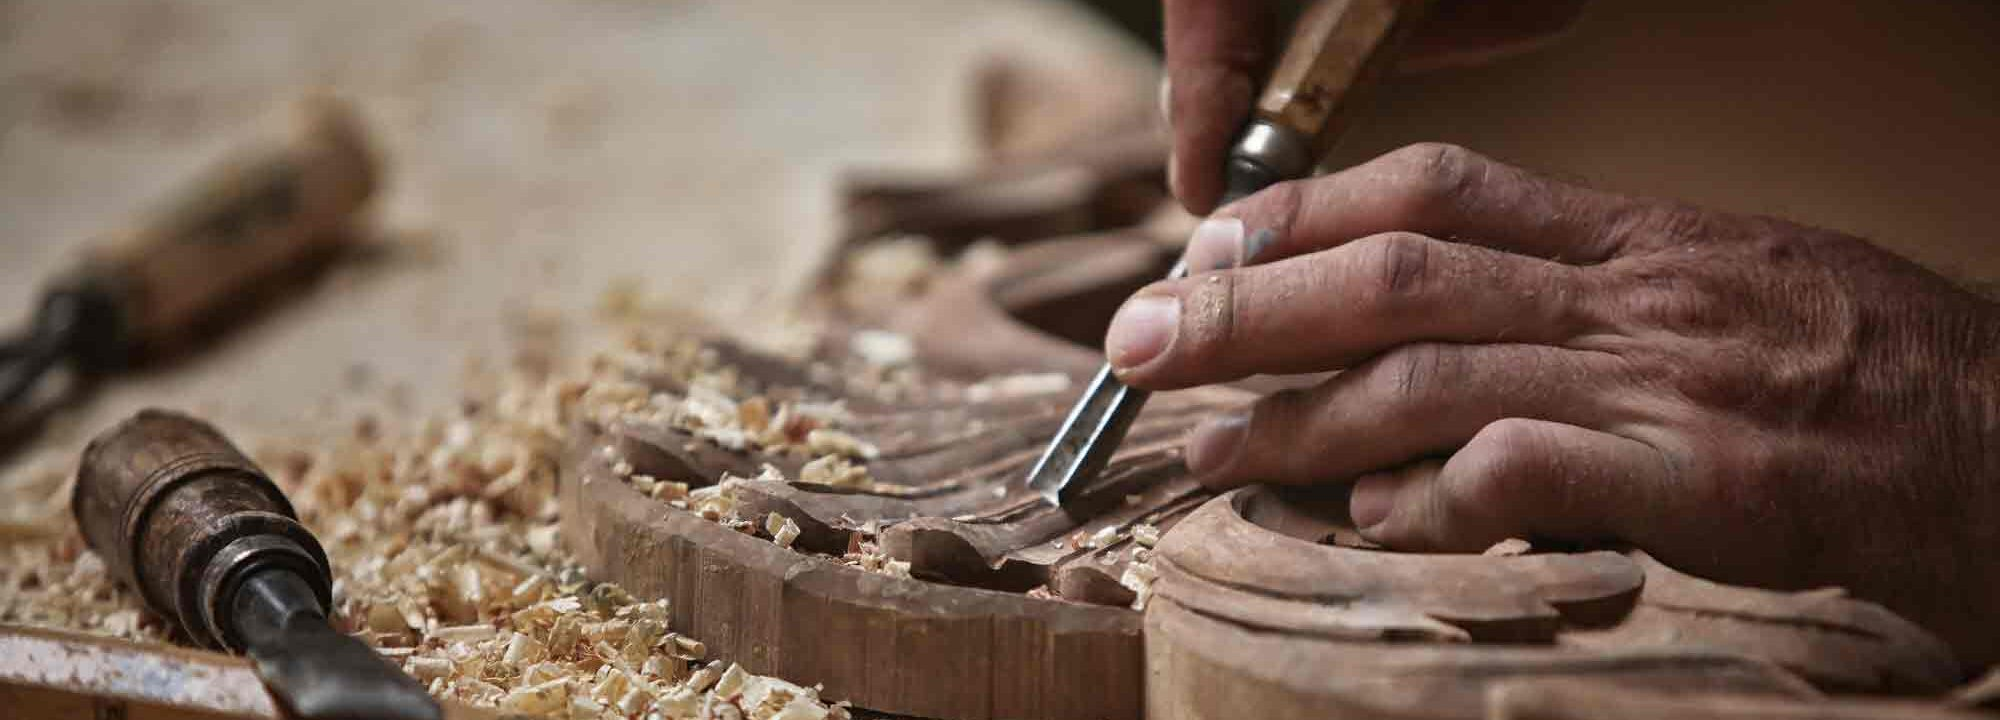 Wye Valley Food Festival Wood Working